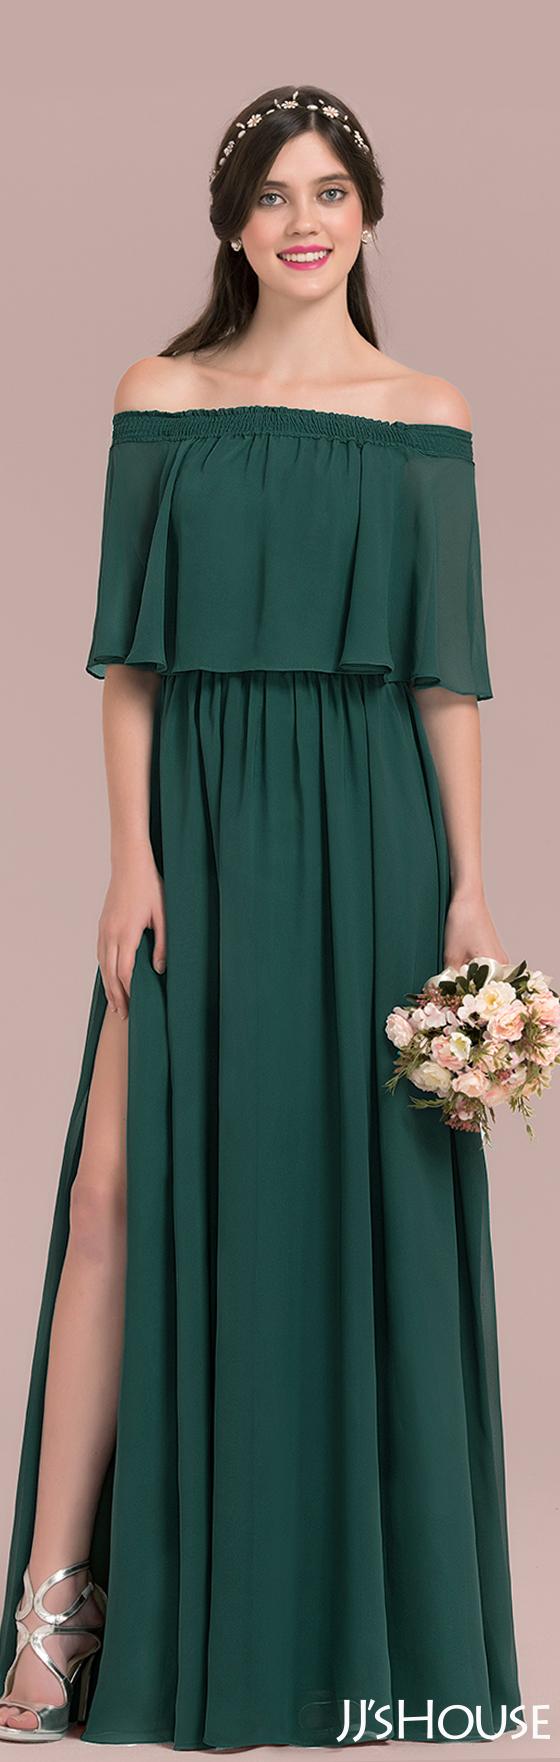 Green bridesmaids dress  Such an amazing bridesmaid dress JJsHouse  Bridesmaid  MODES